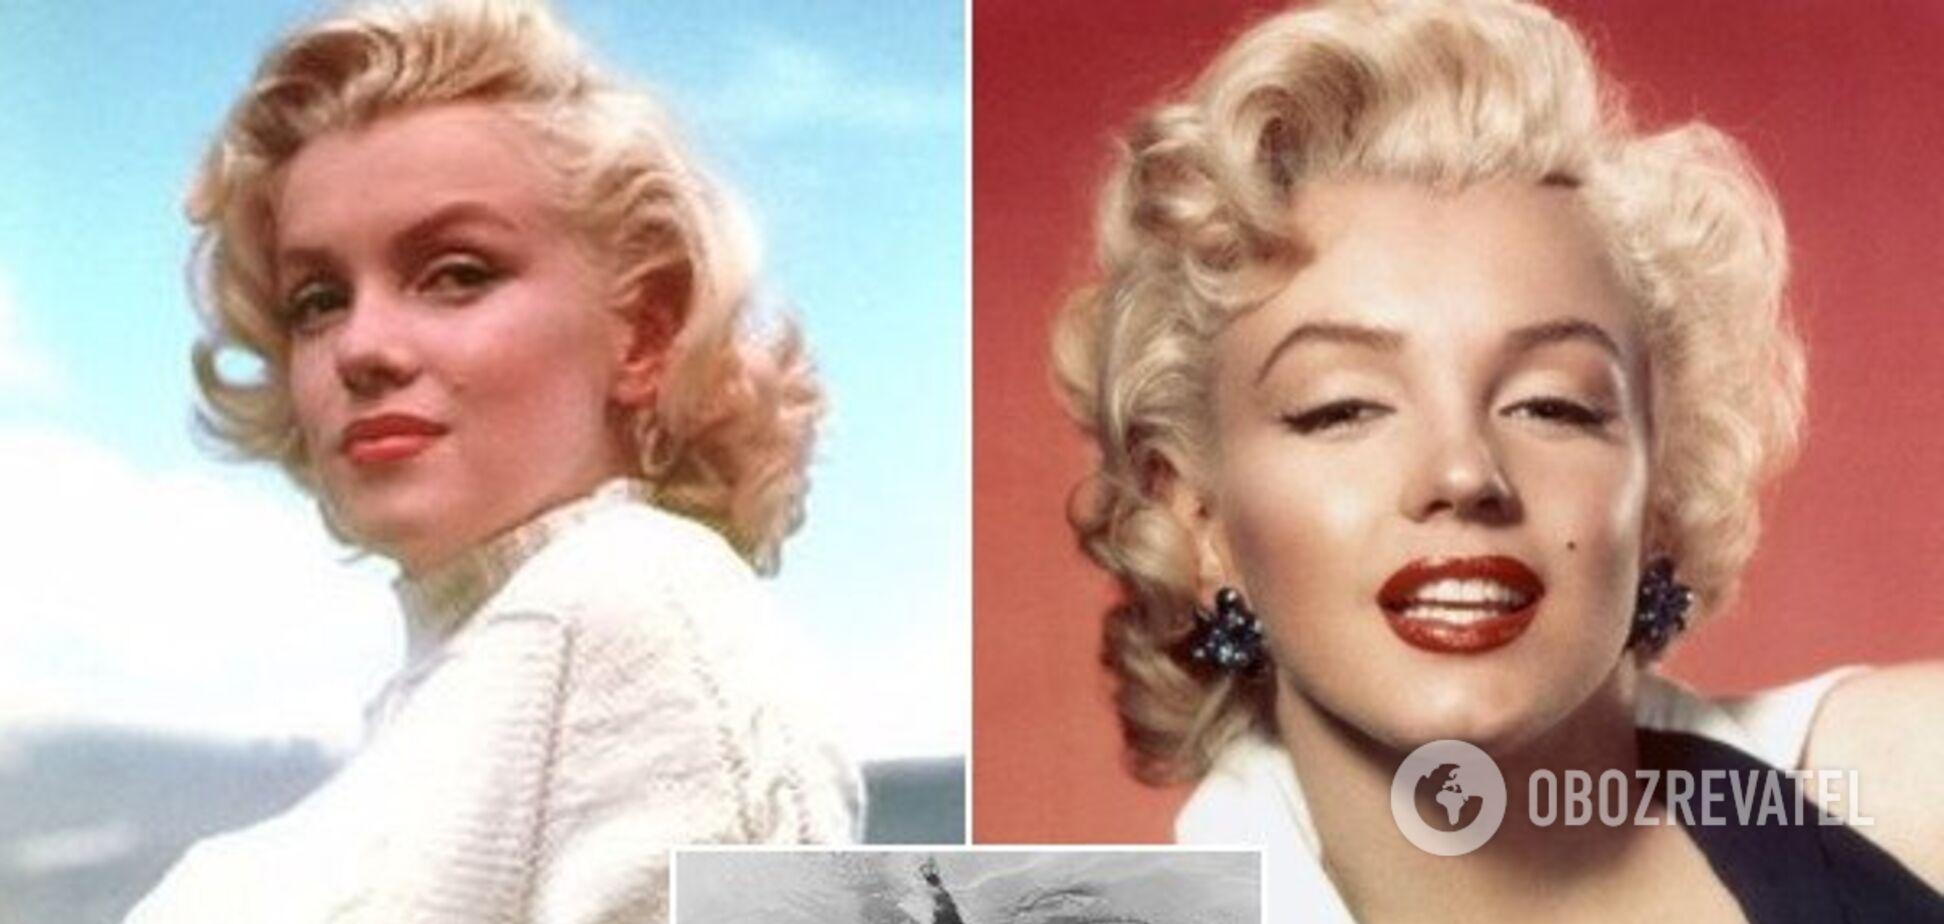 Стало известно о голых фото Мэрилин Монро